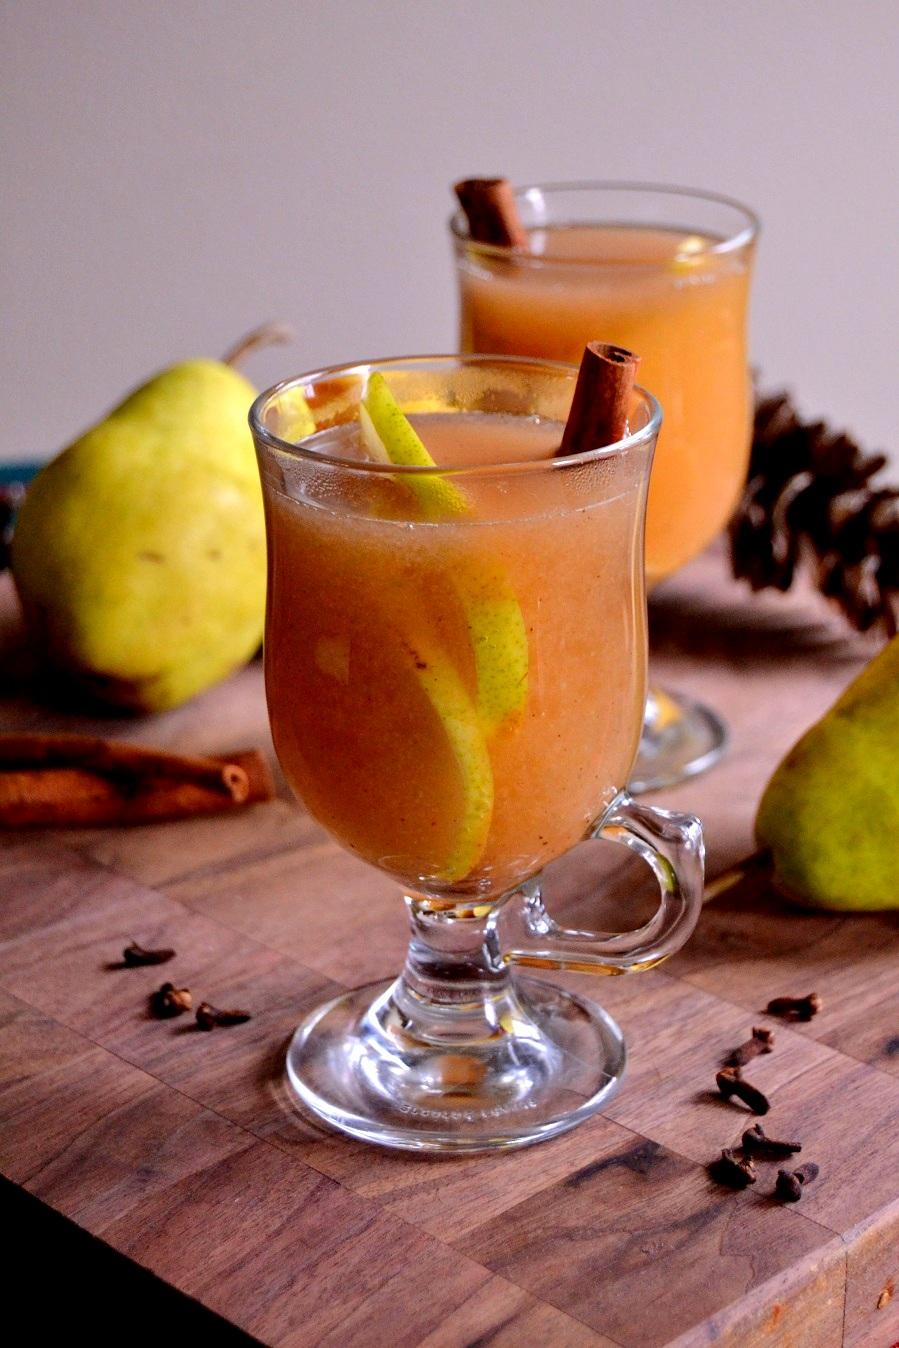 Slow Cooker Spiced Pear Cider